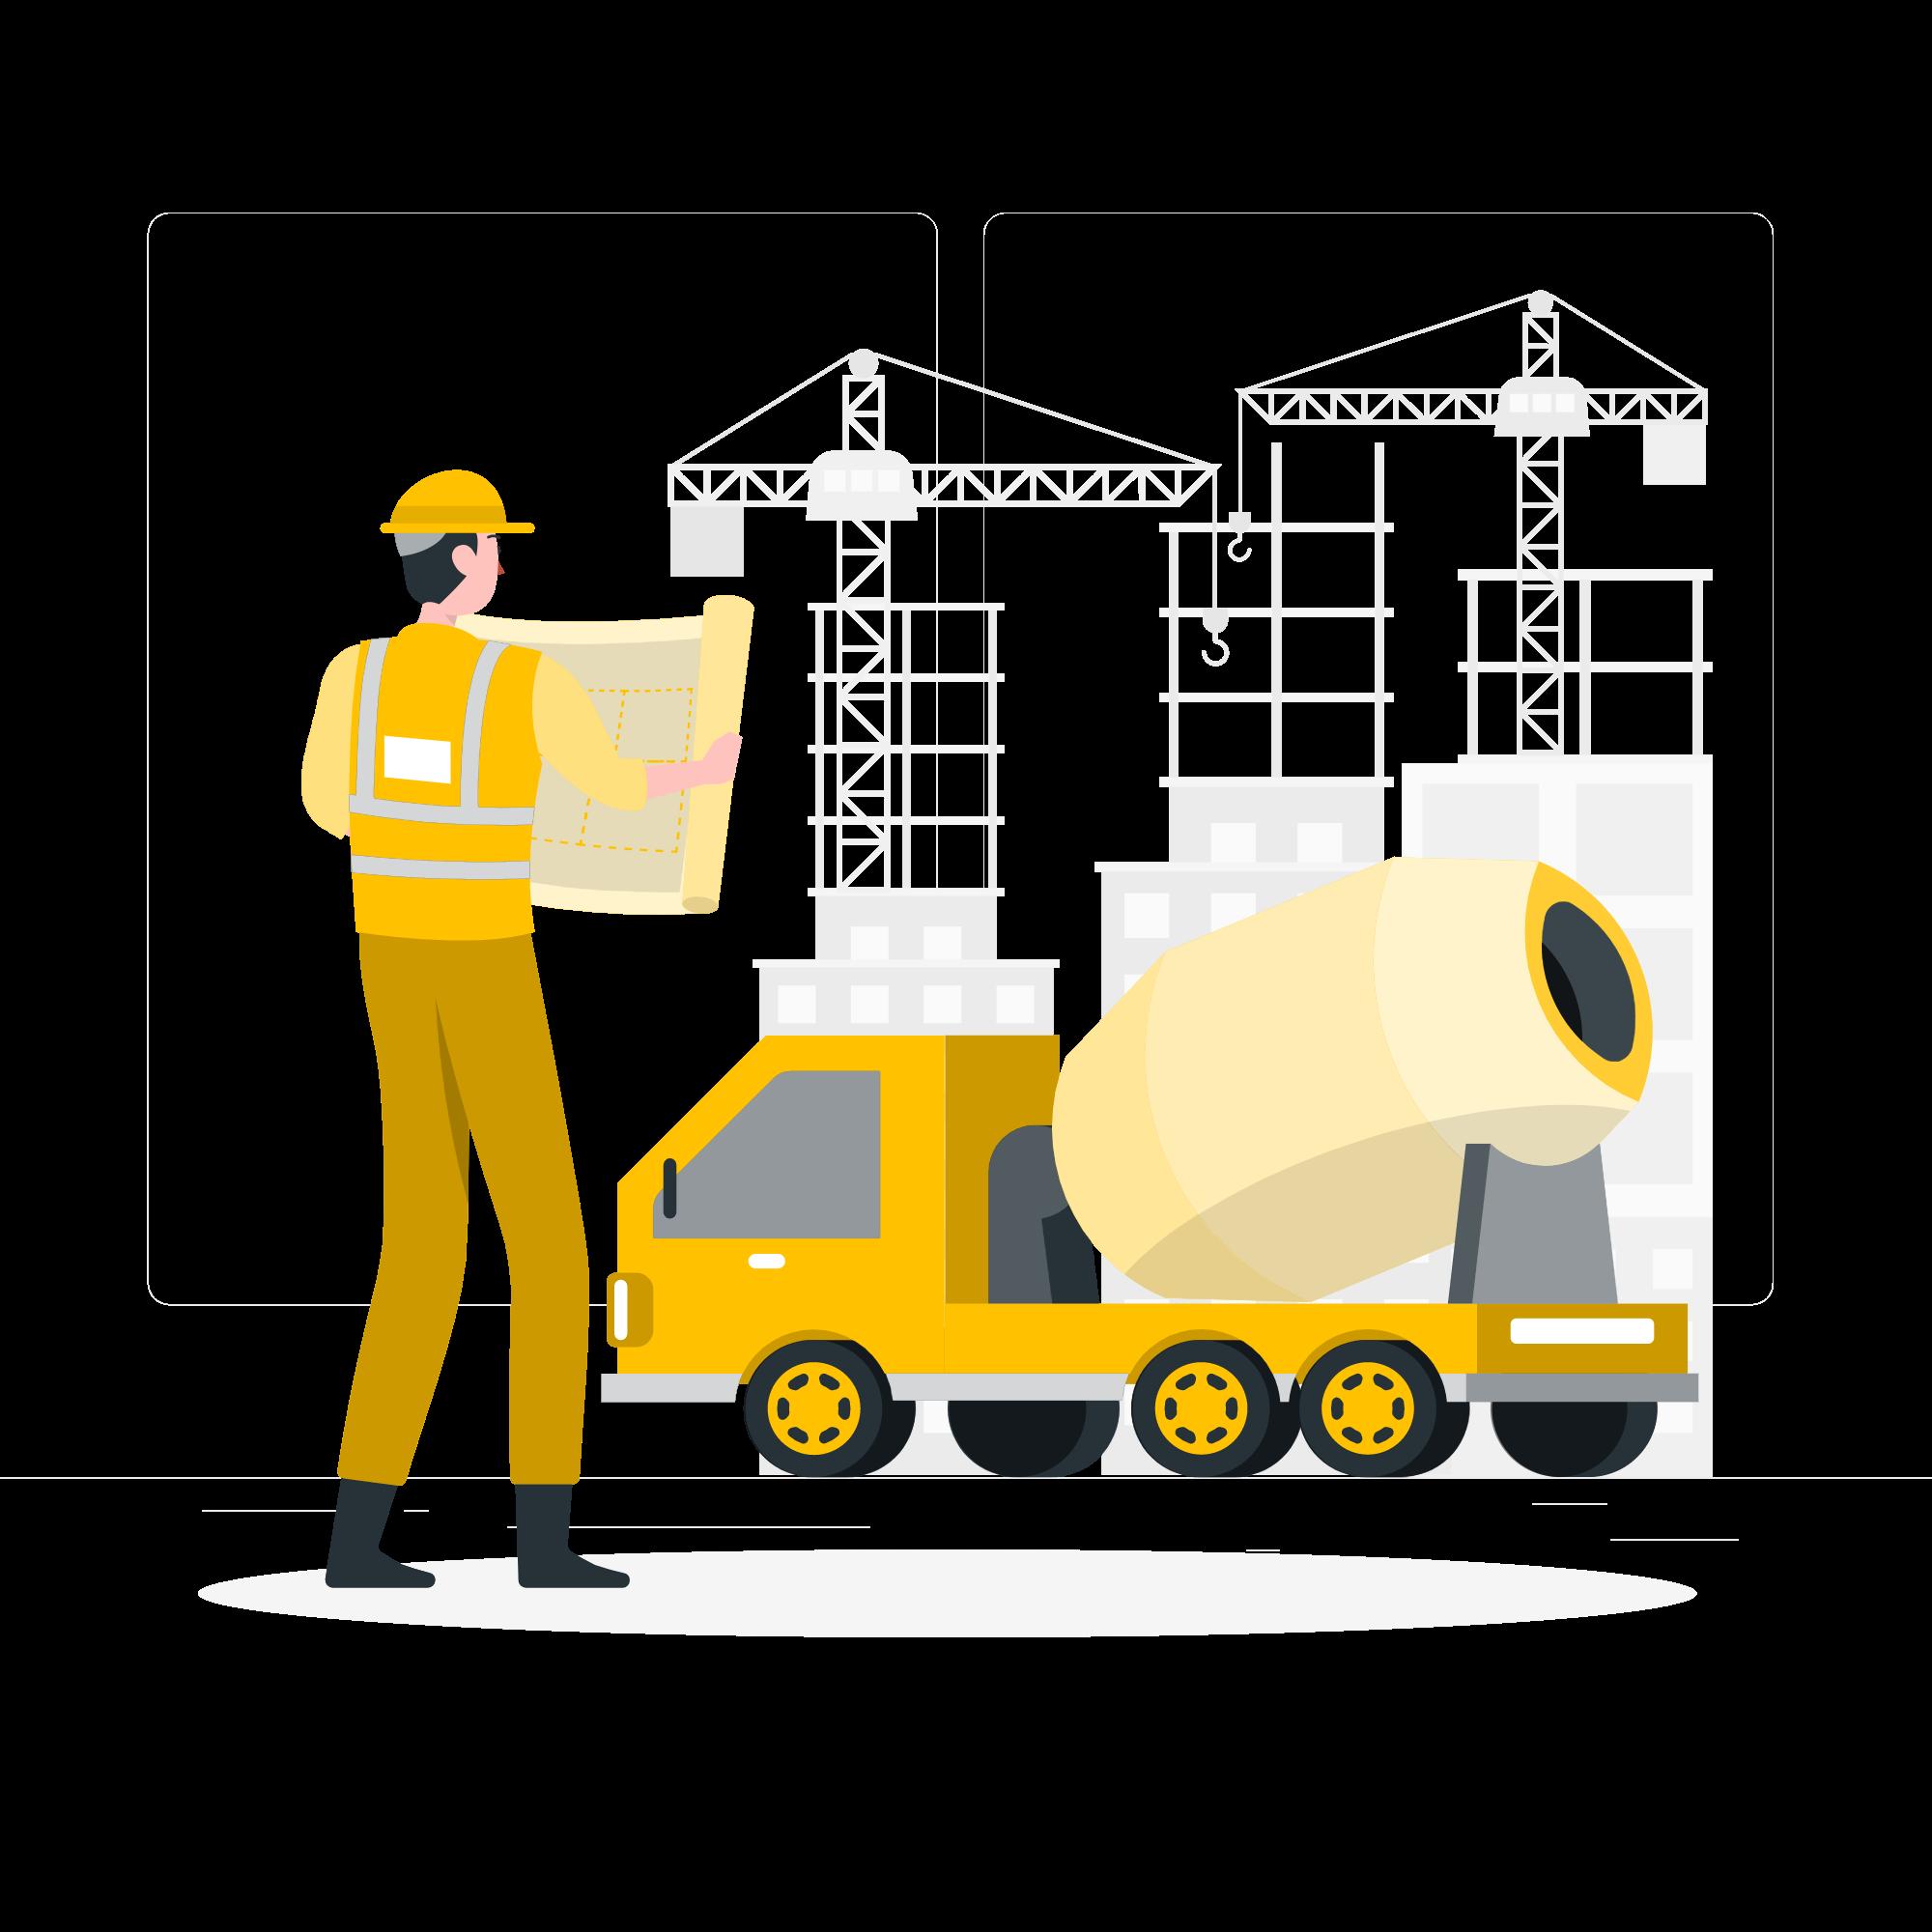 Introduce semi-autonomous equipment in your construction equipment rental company